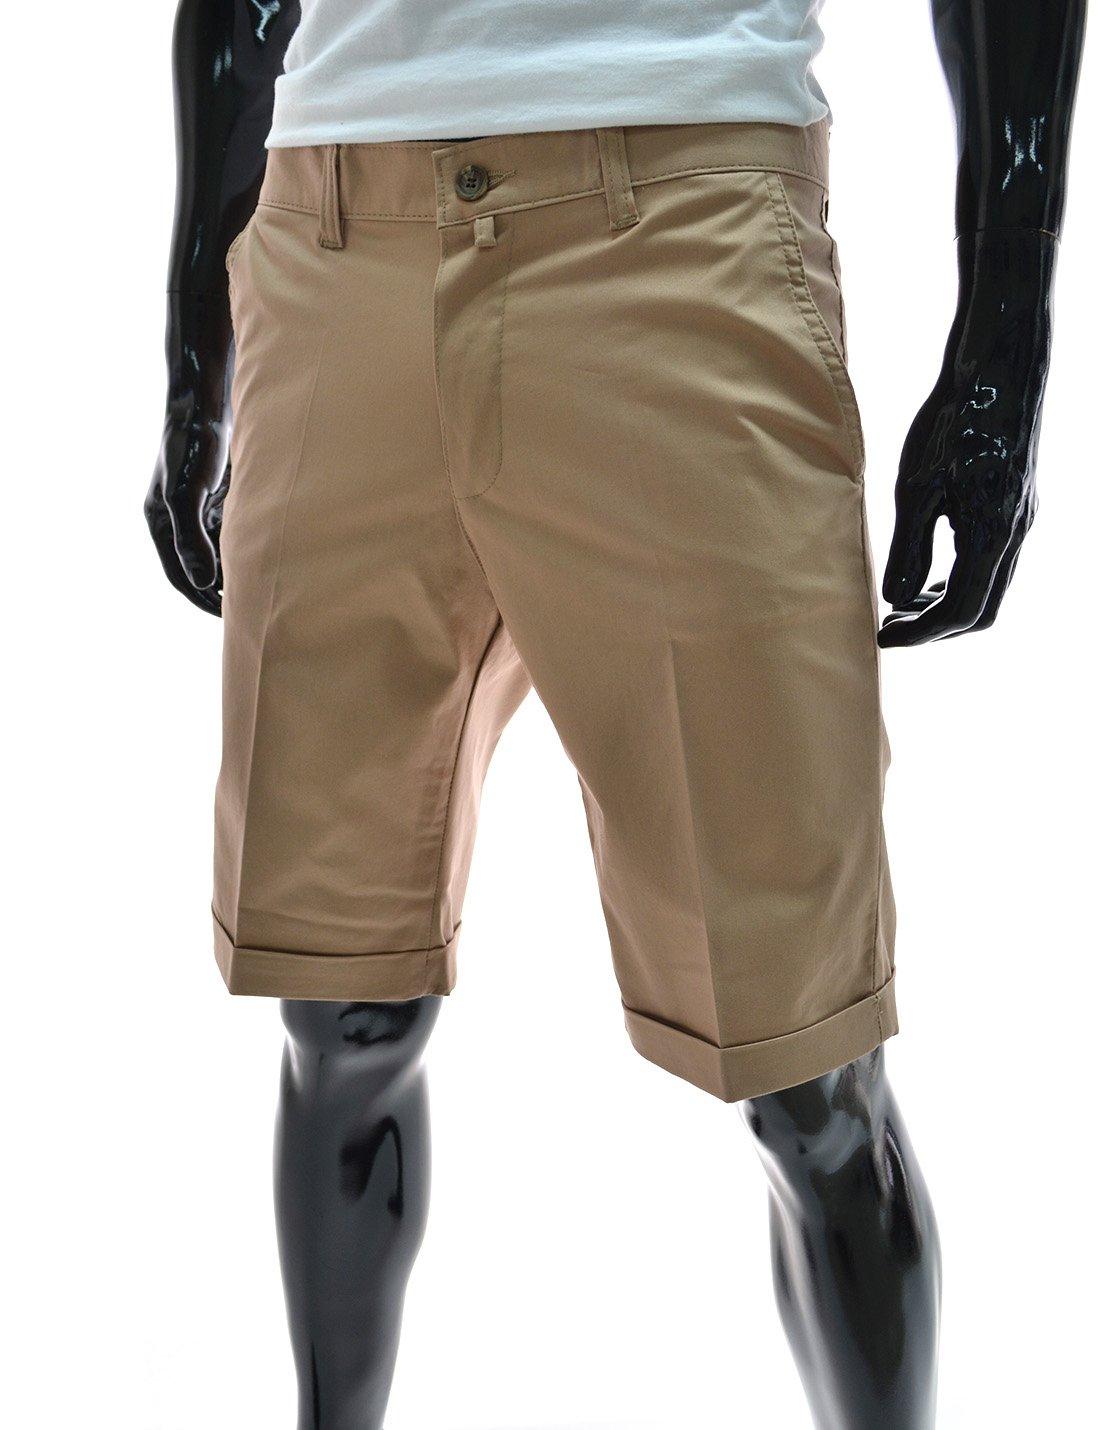 bermuda shorts im anzugstyle